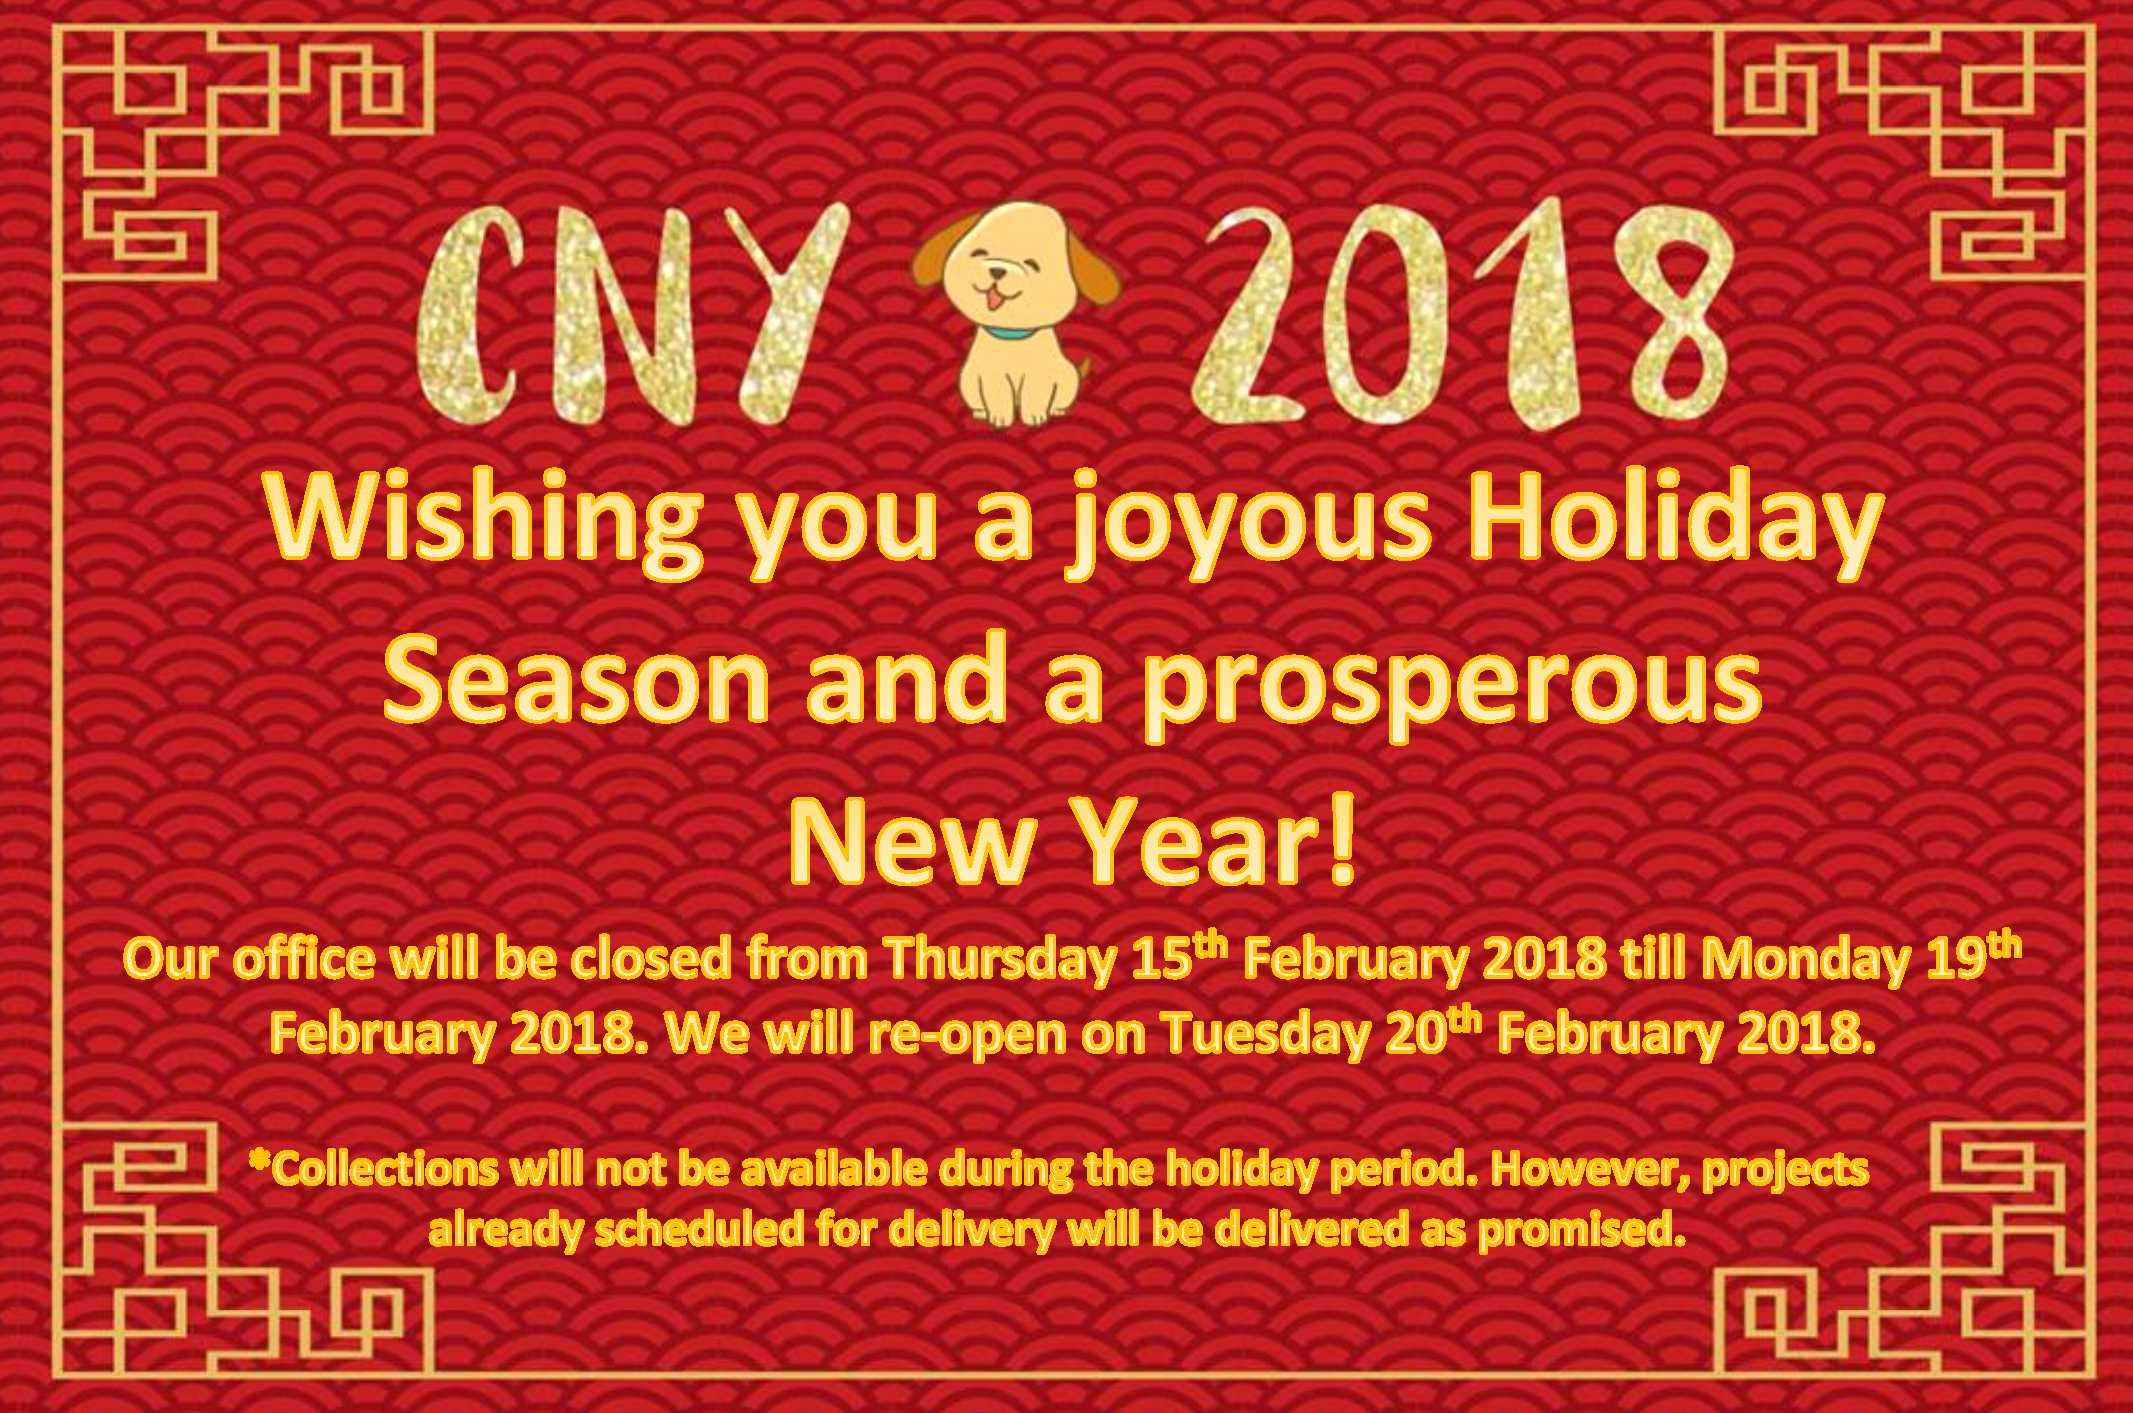 CNY 2018-2